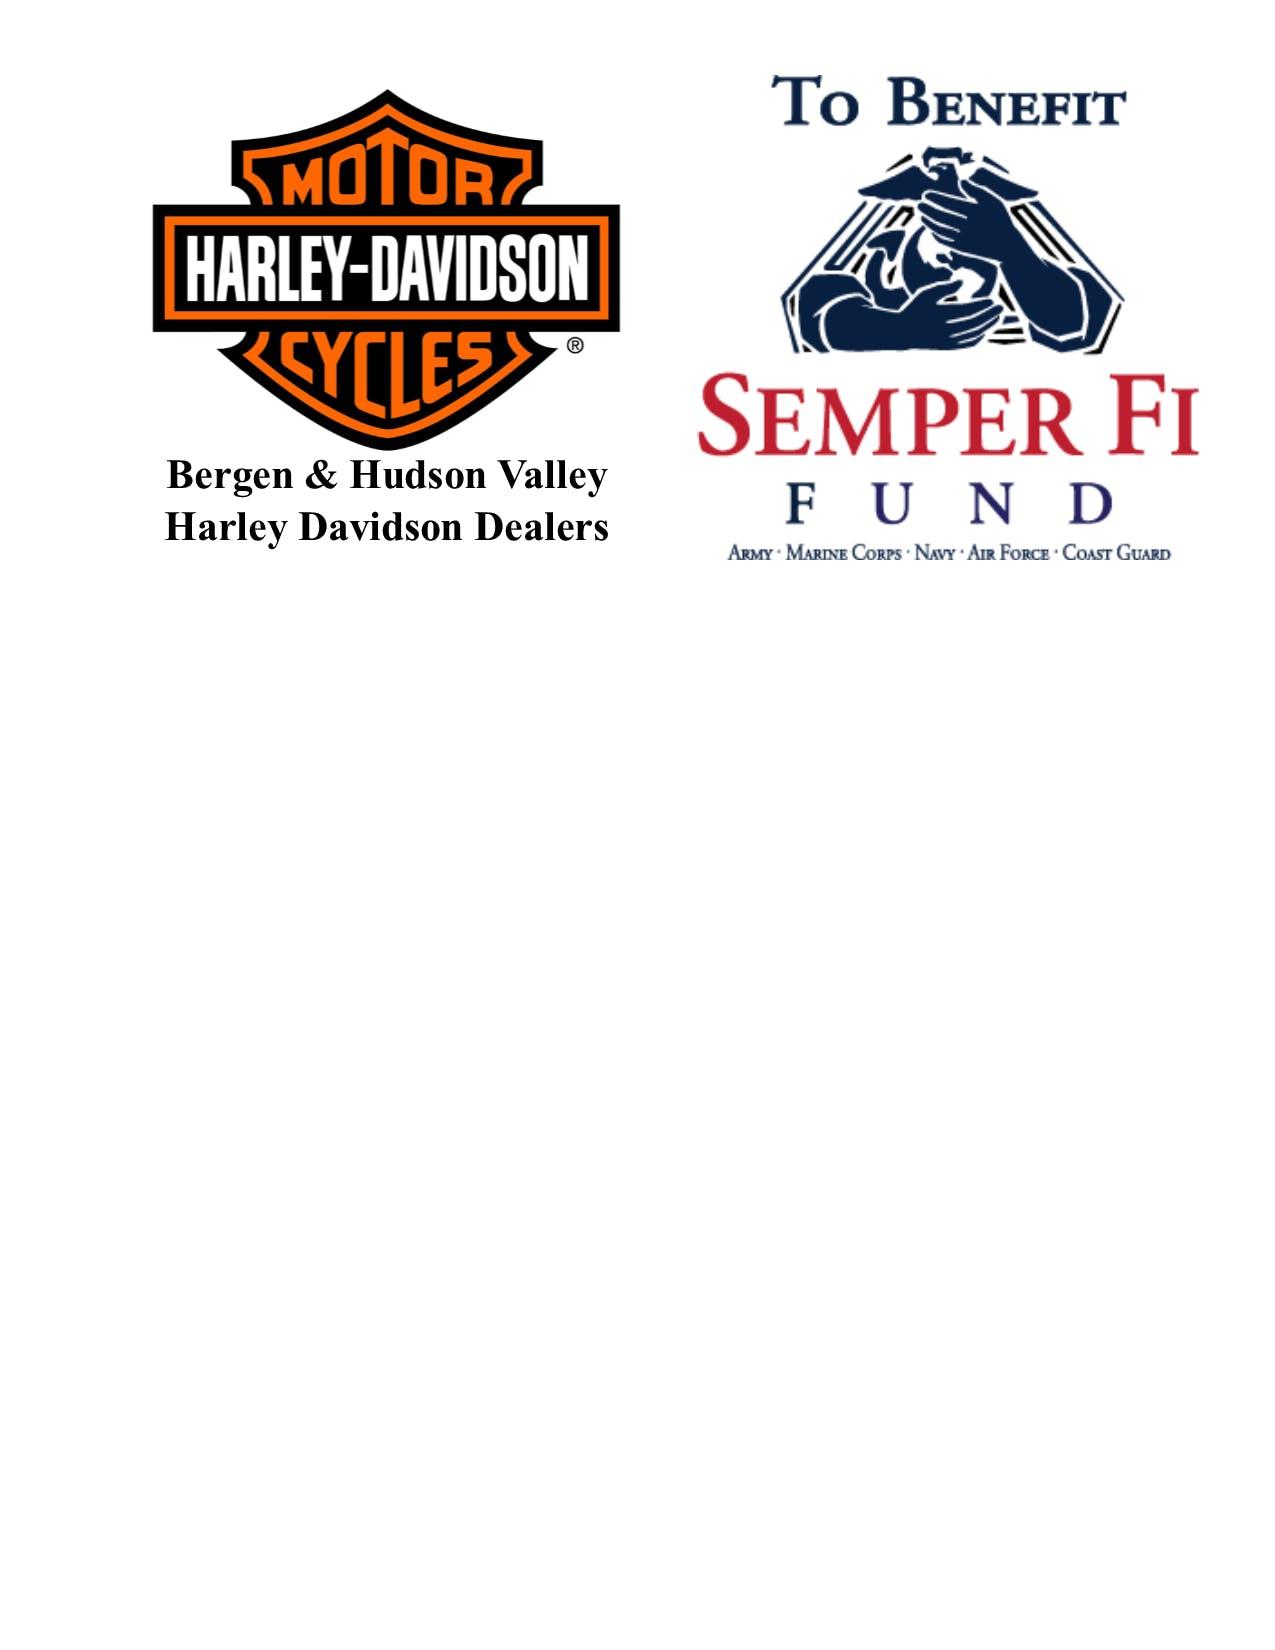 Semper Fi Fund Motorcycle Run